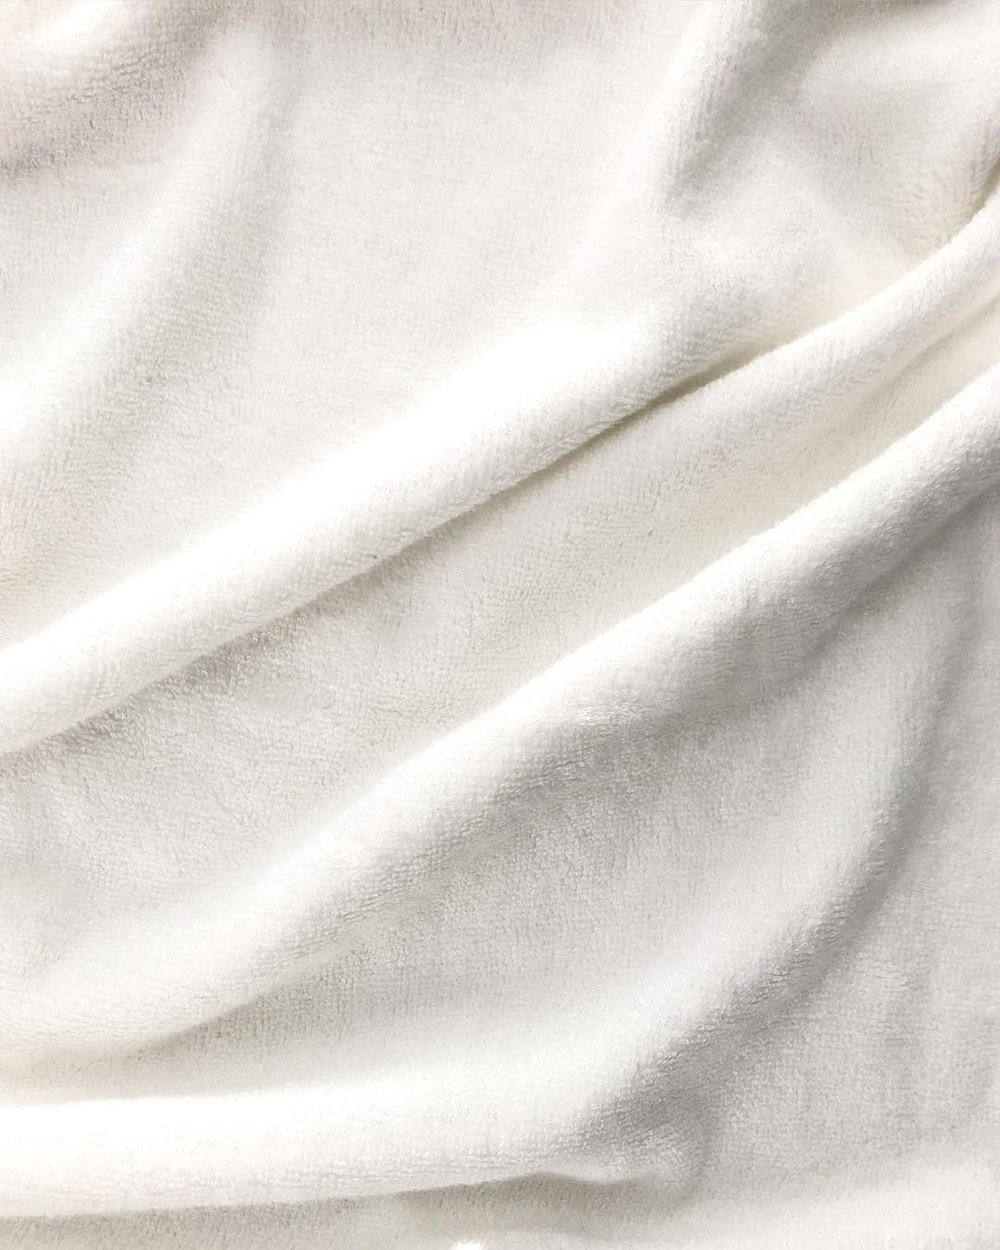 textura oveja.jpg